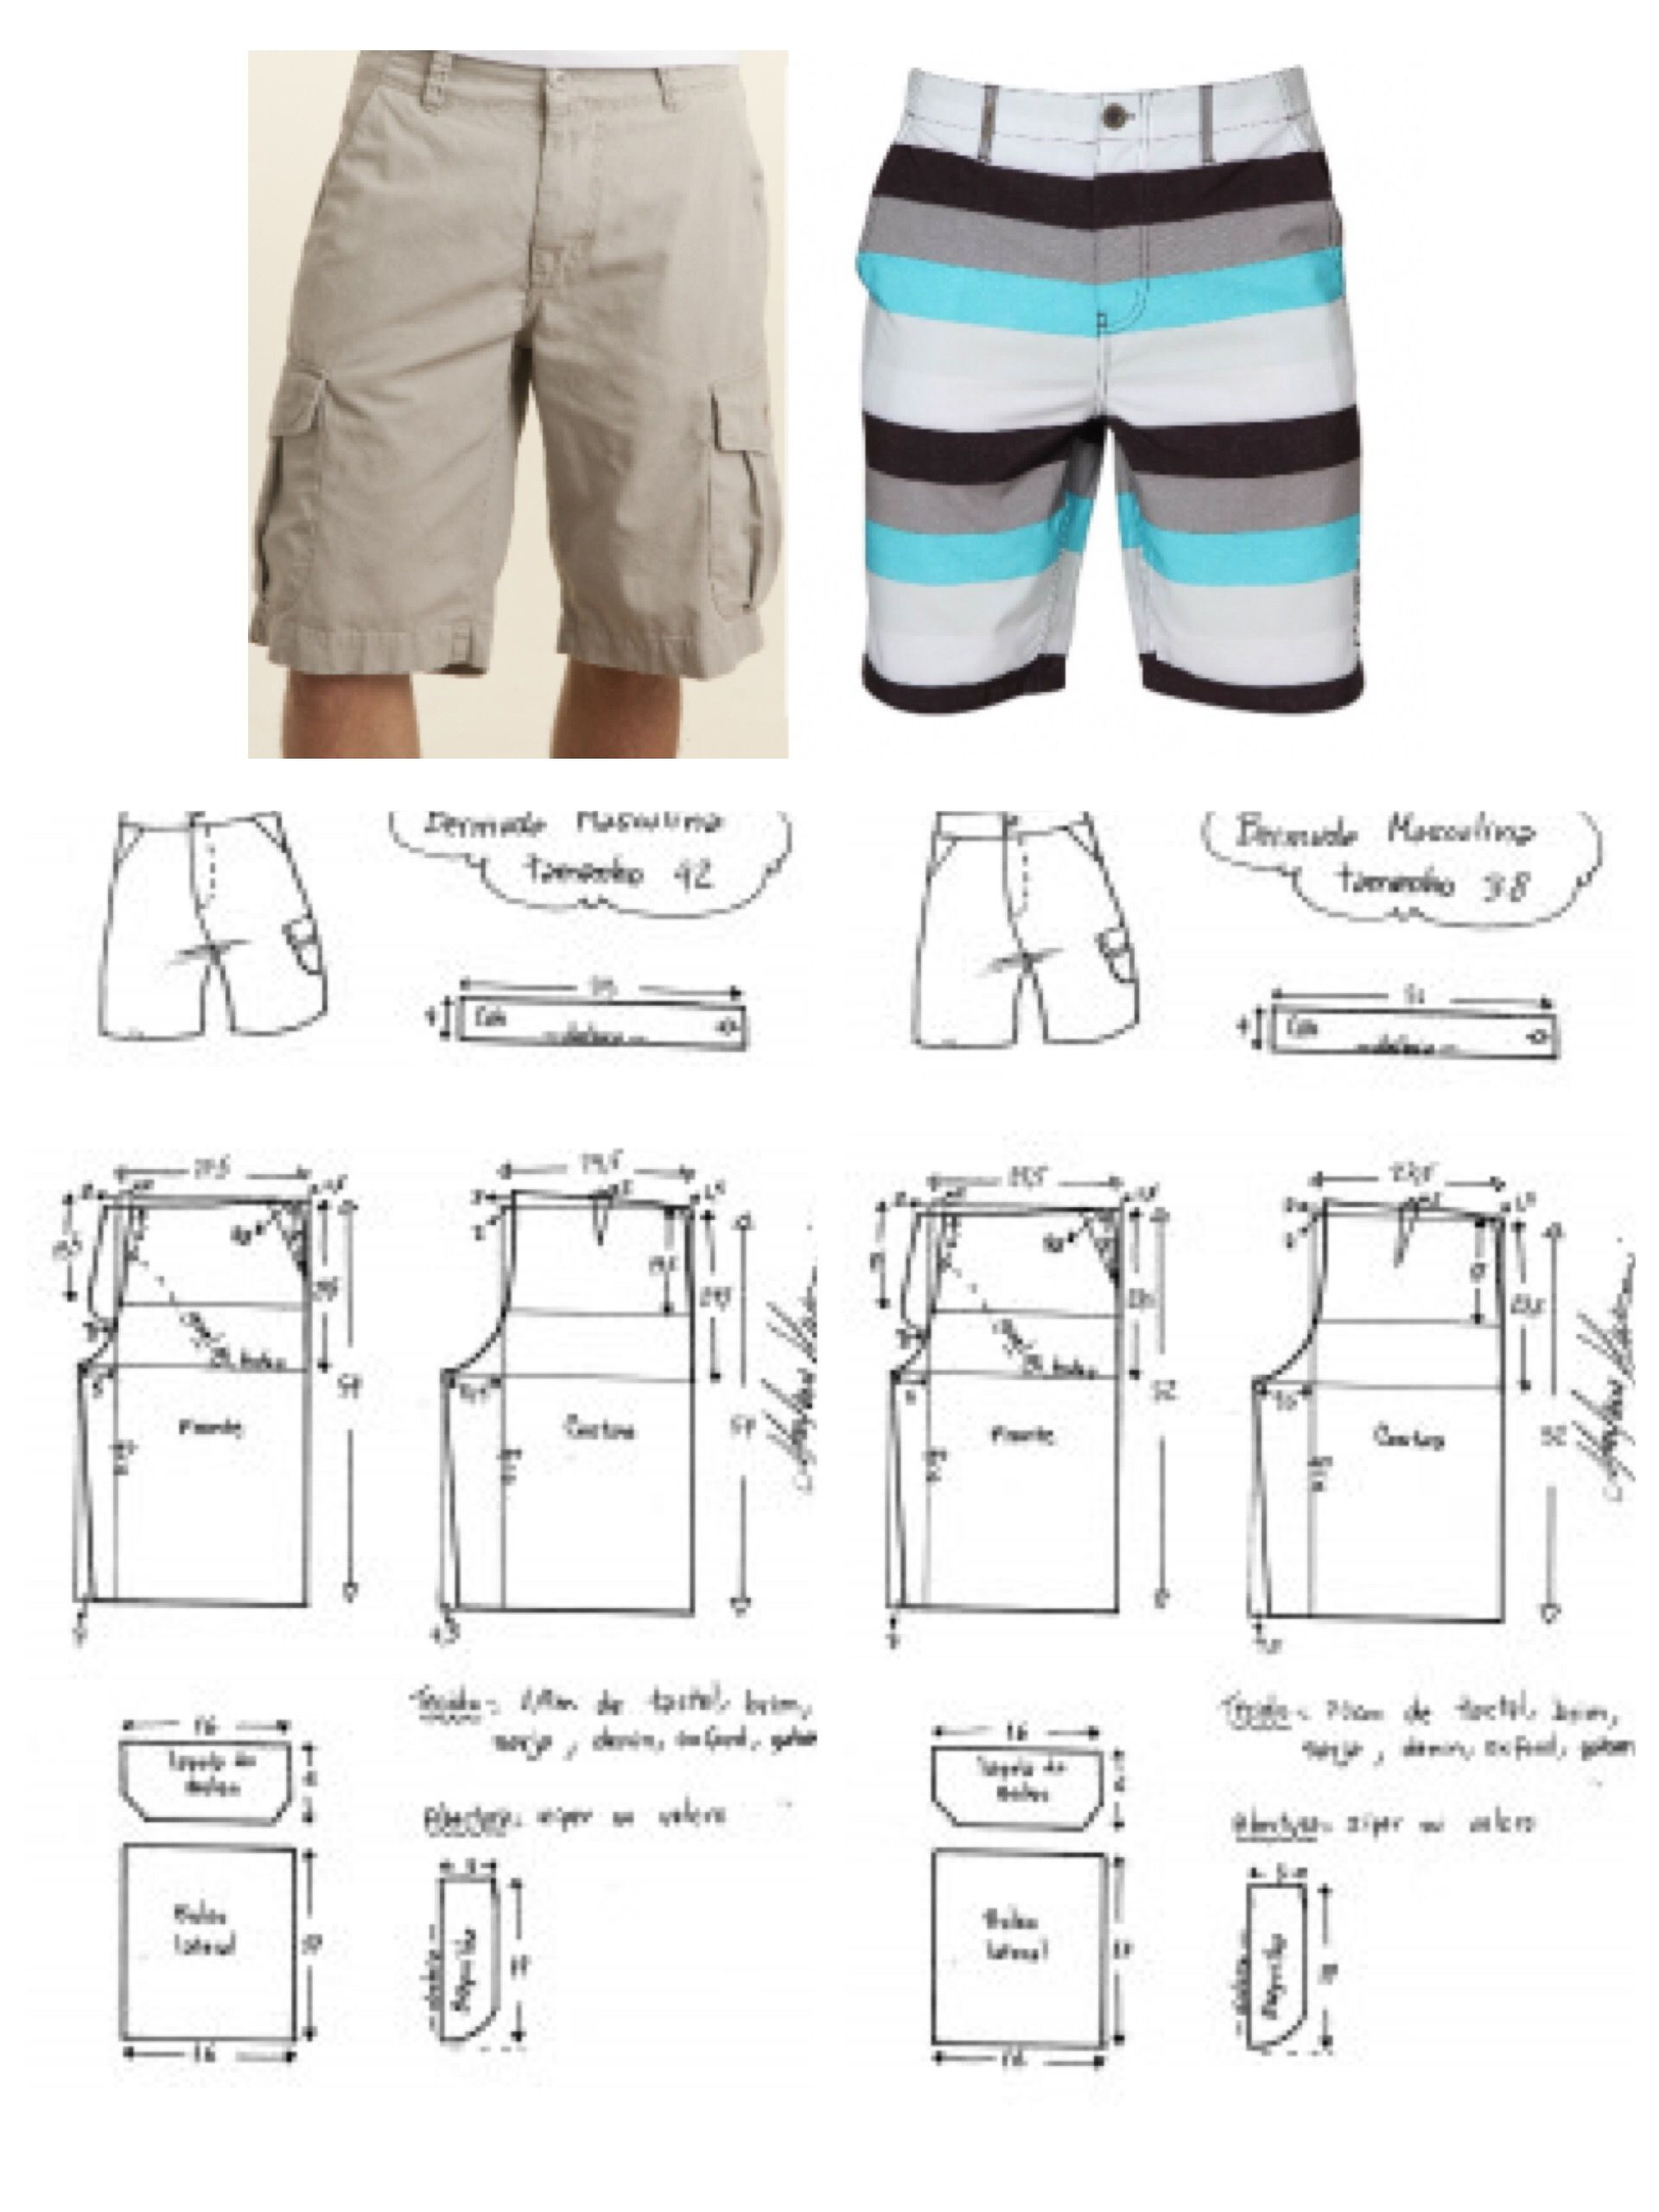 short pants | irmita | Pinterest | Costura, Molde y Patrones